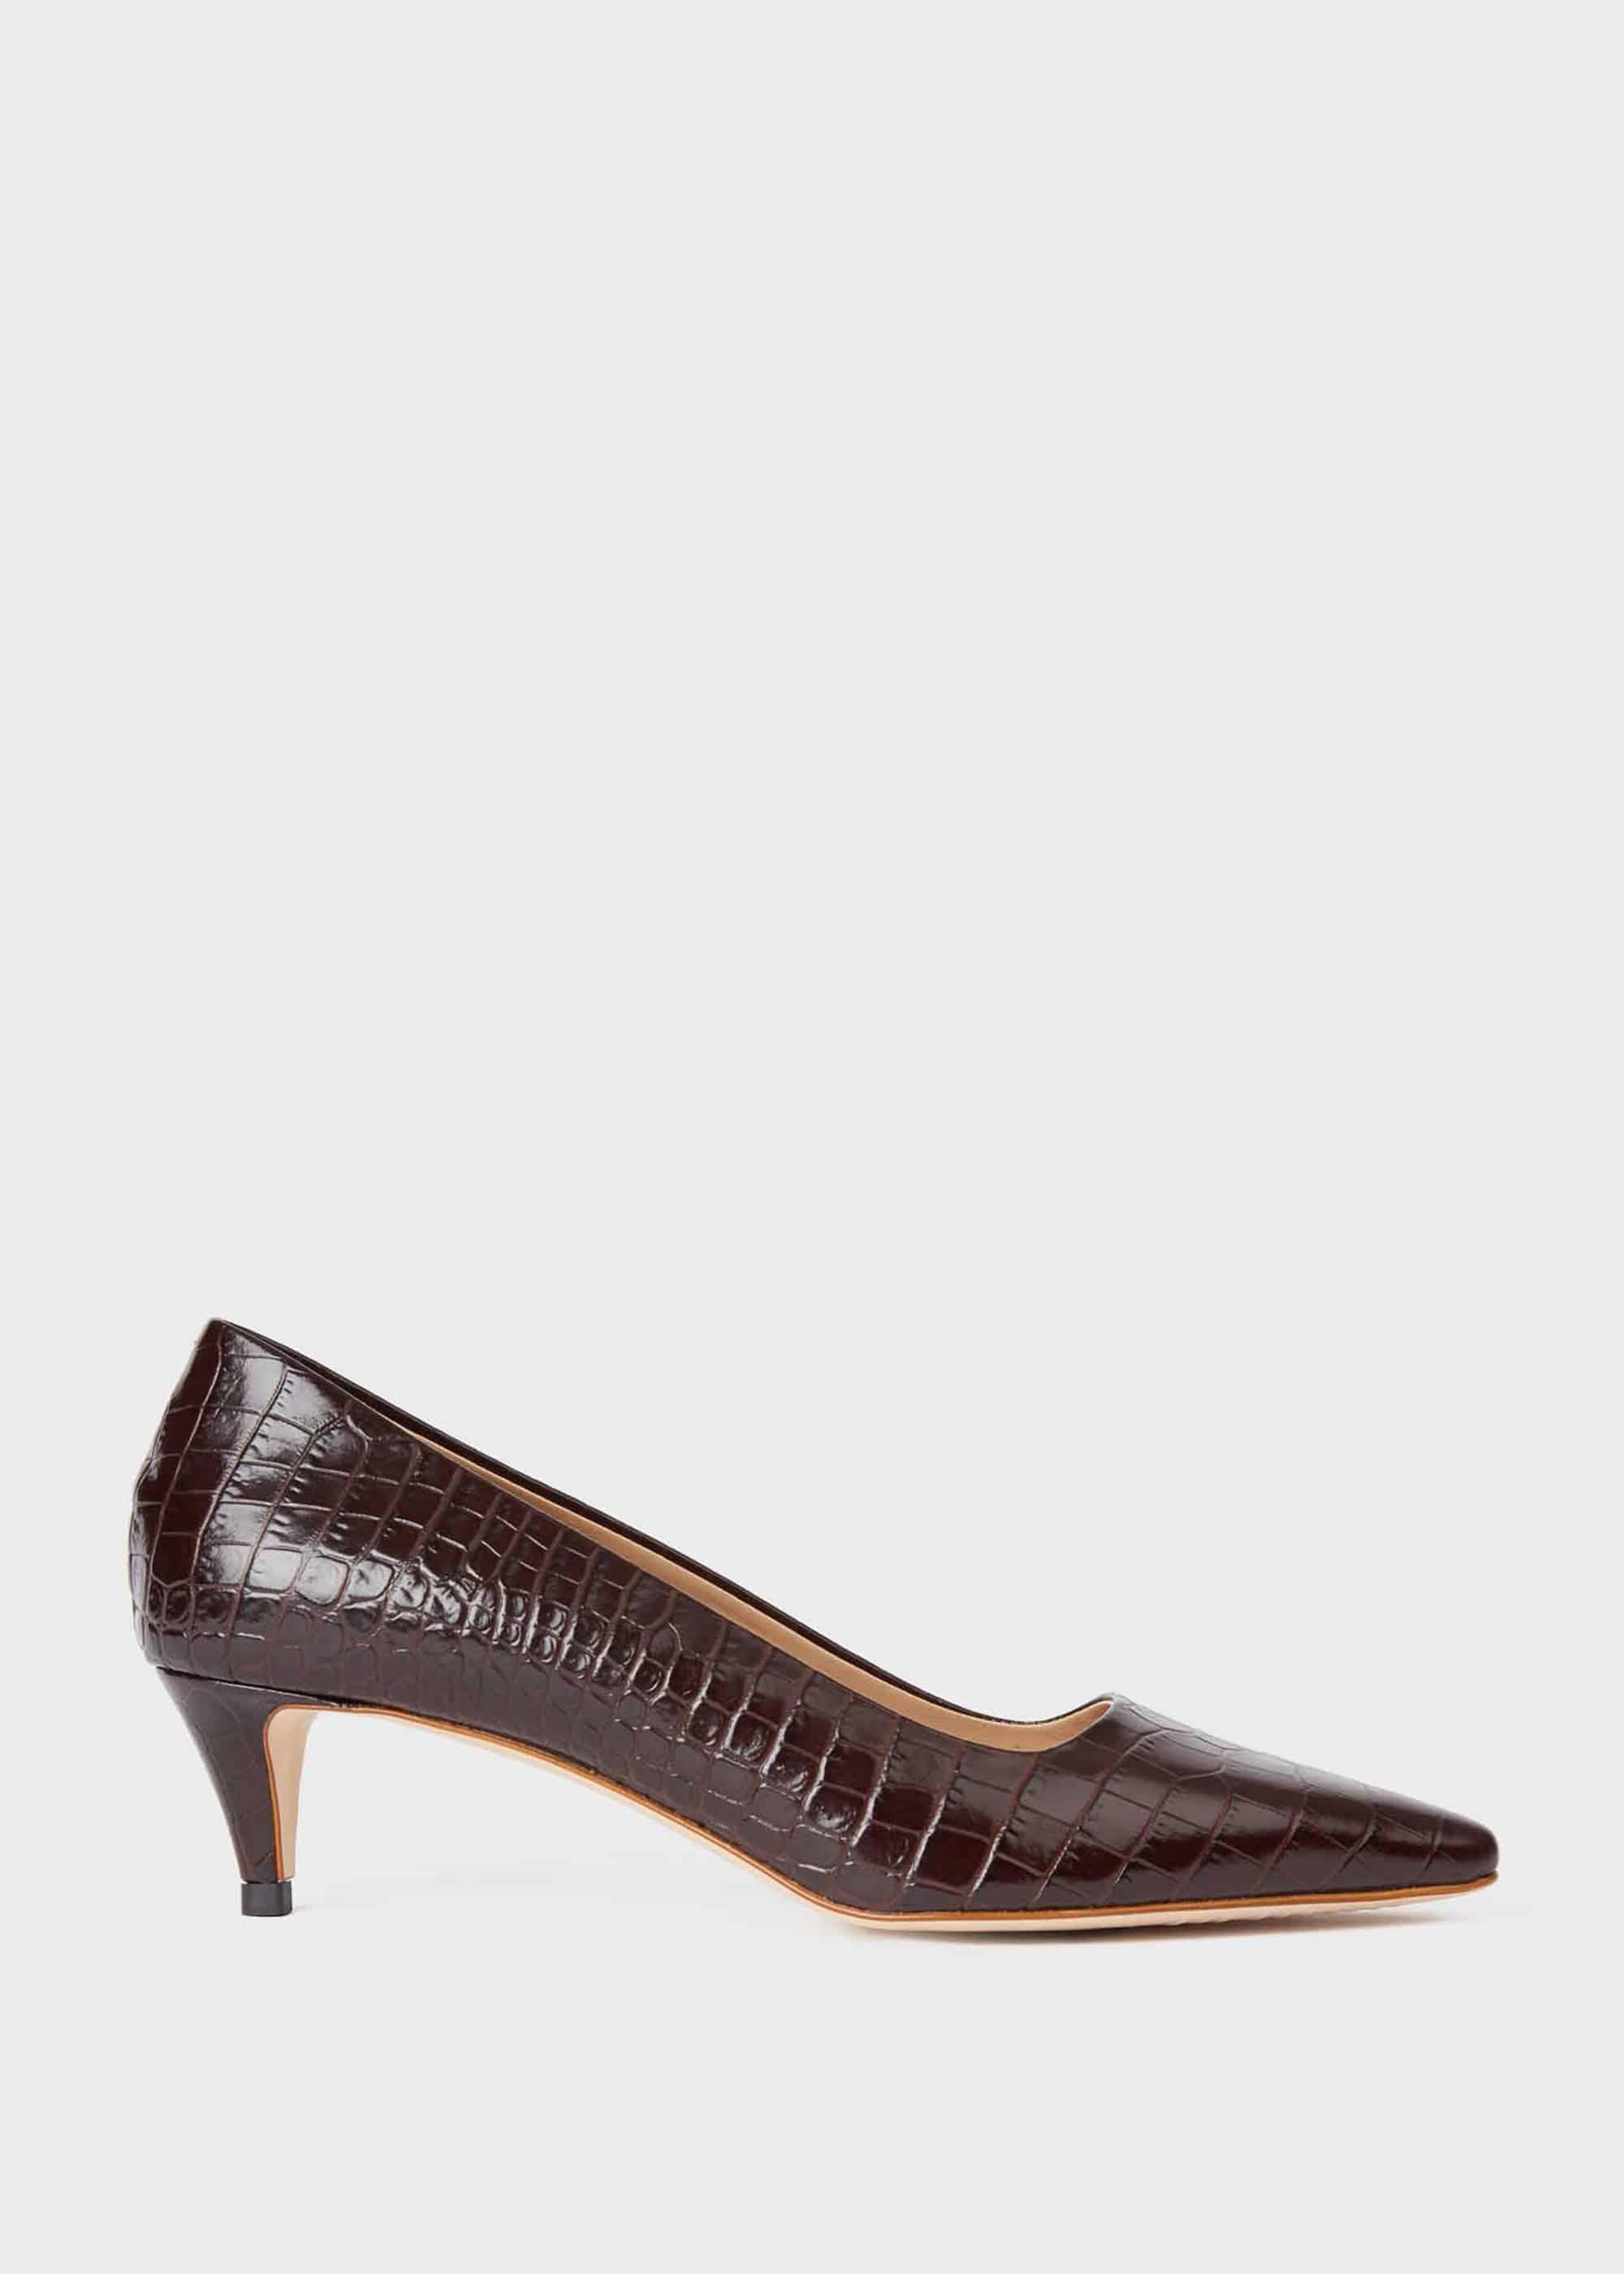 Hobbs Women Millie Crocodile Kitten Heel Court Shoes